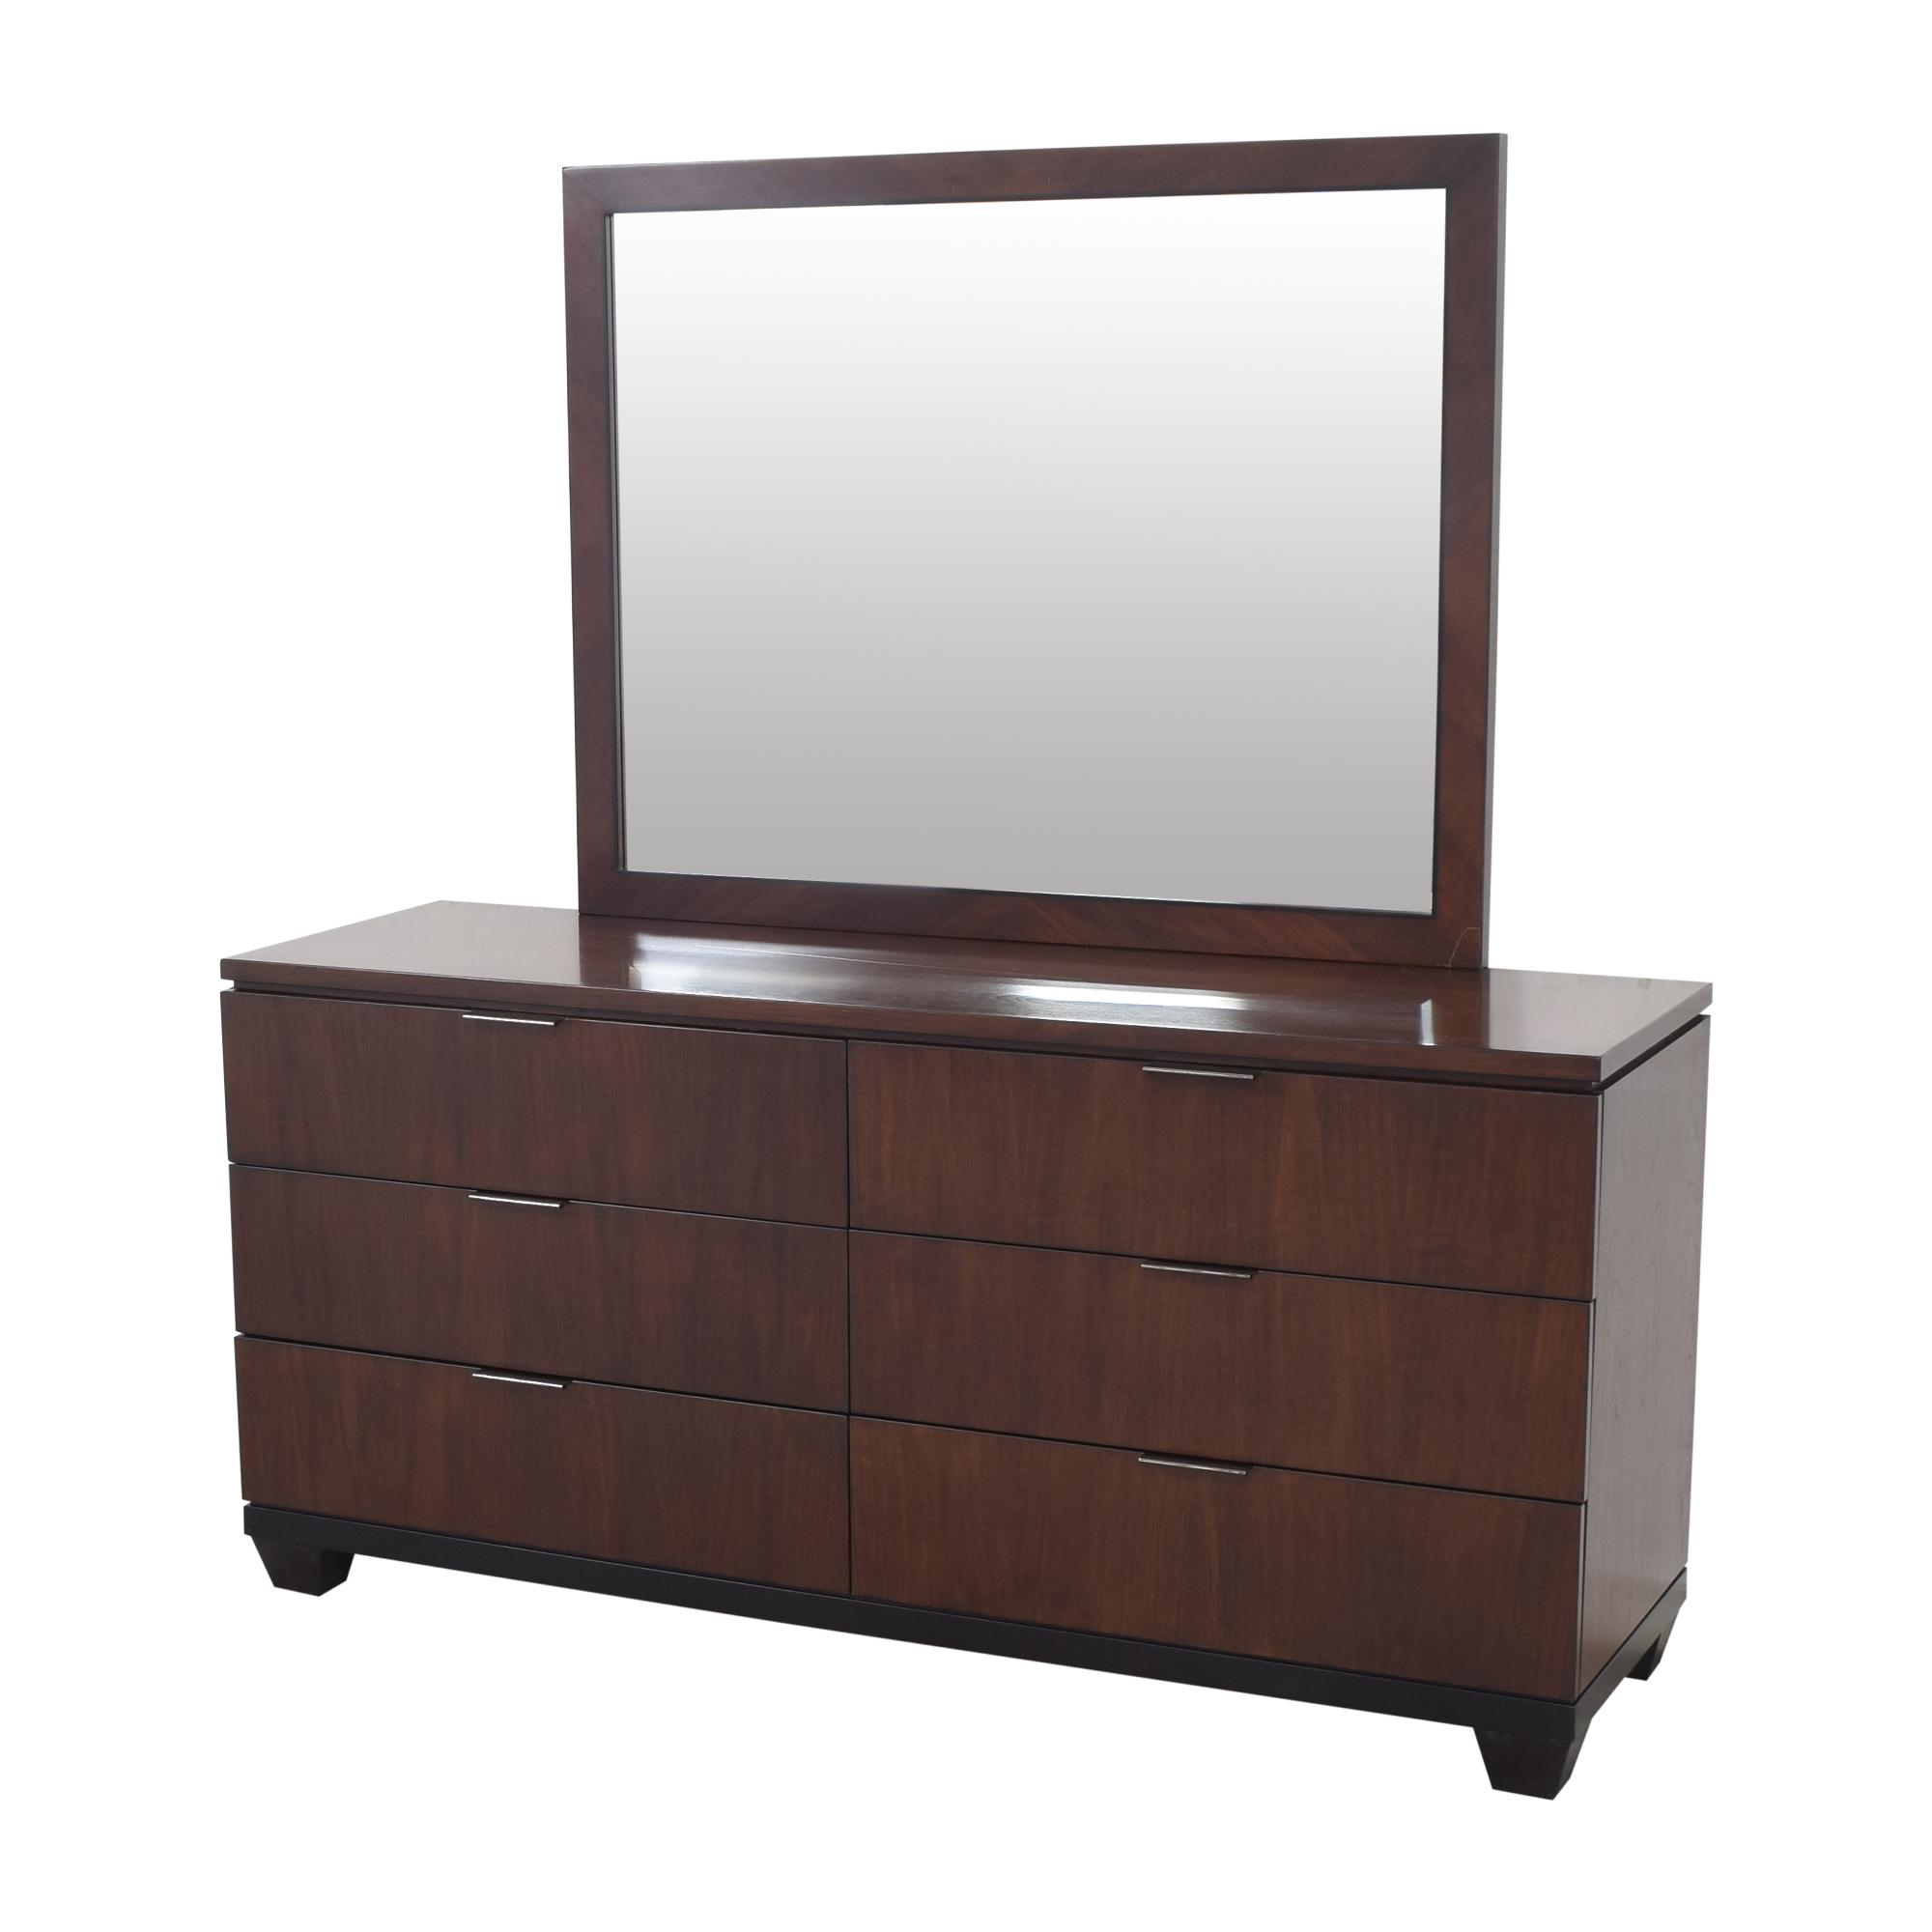 Macy's Macy's Double Dresser and Mirror price